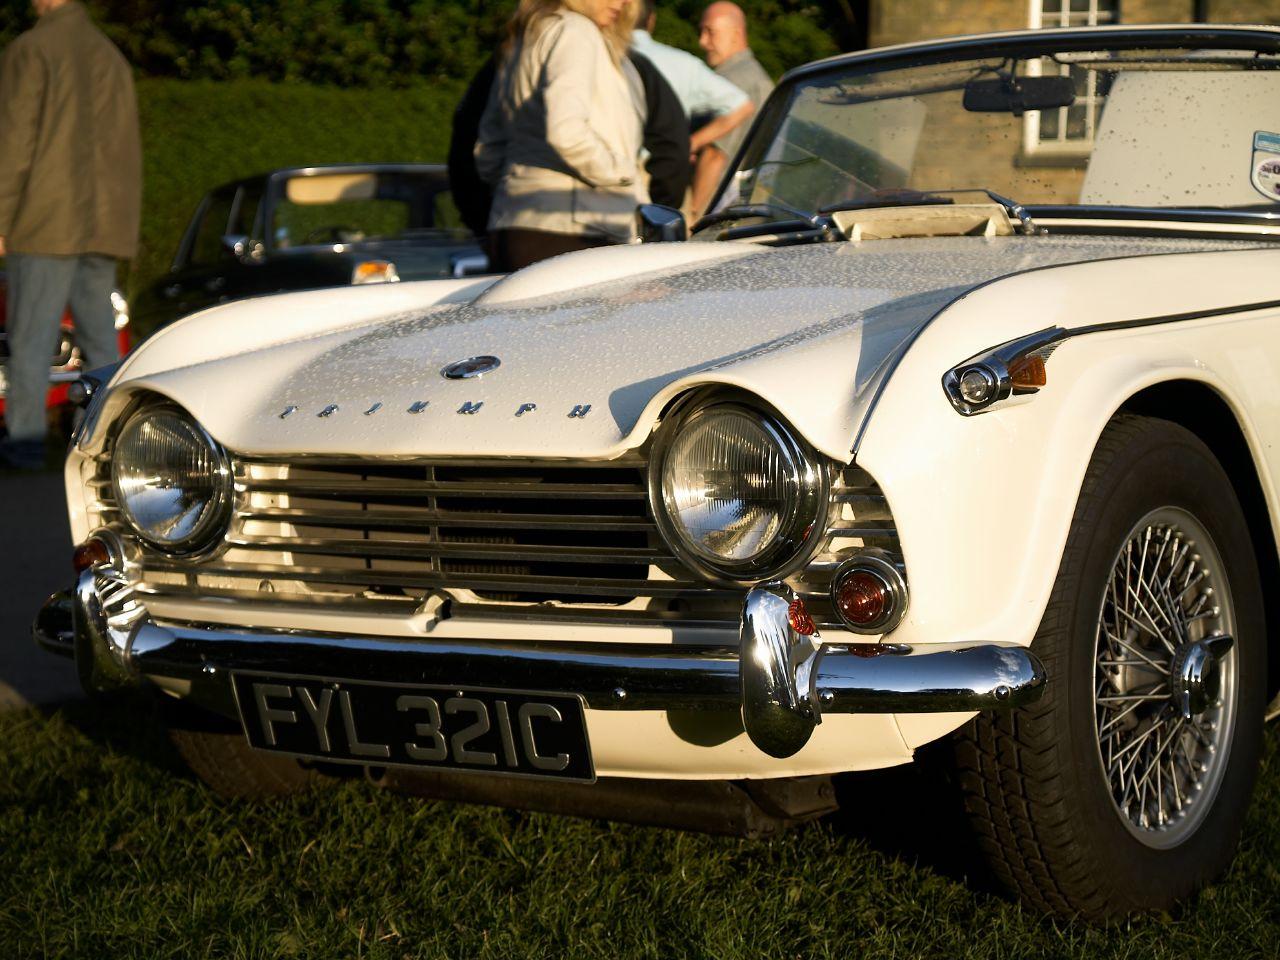 File:Triumph TR5 Renishaw Classic Car Show (1).jpg - Wikimedia Commons